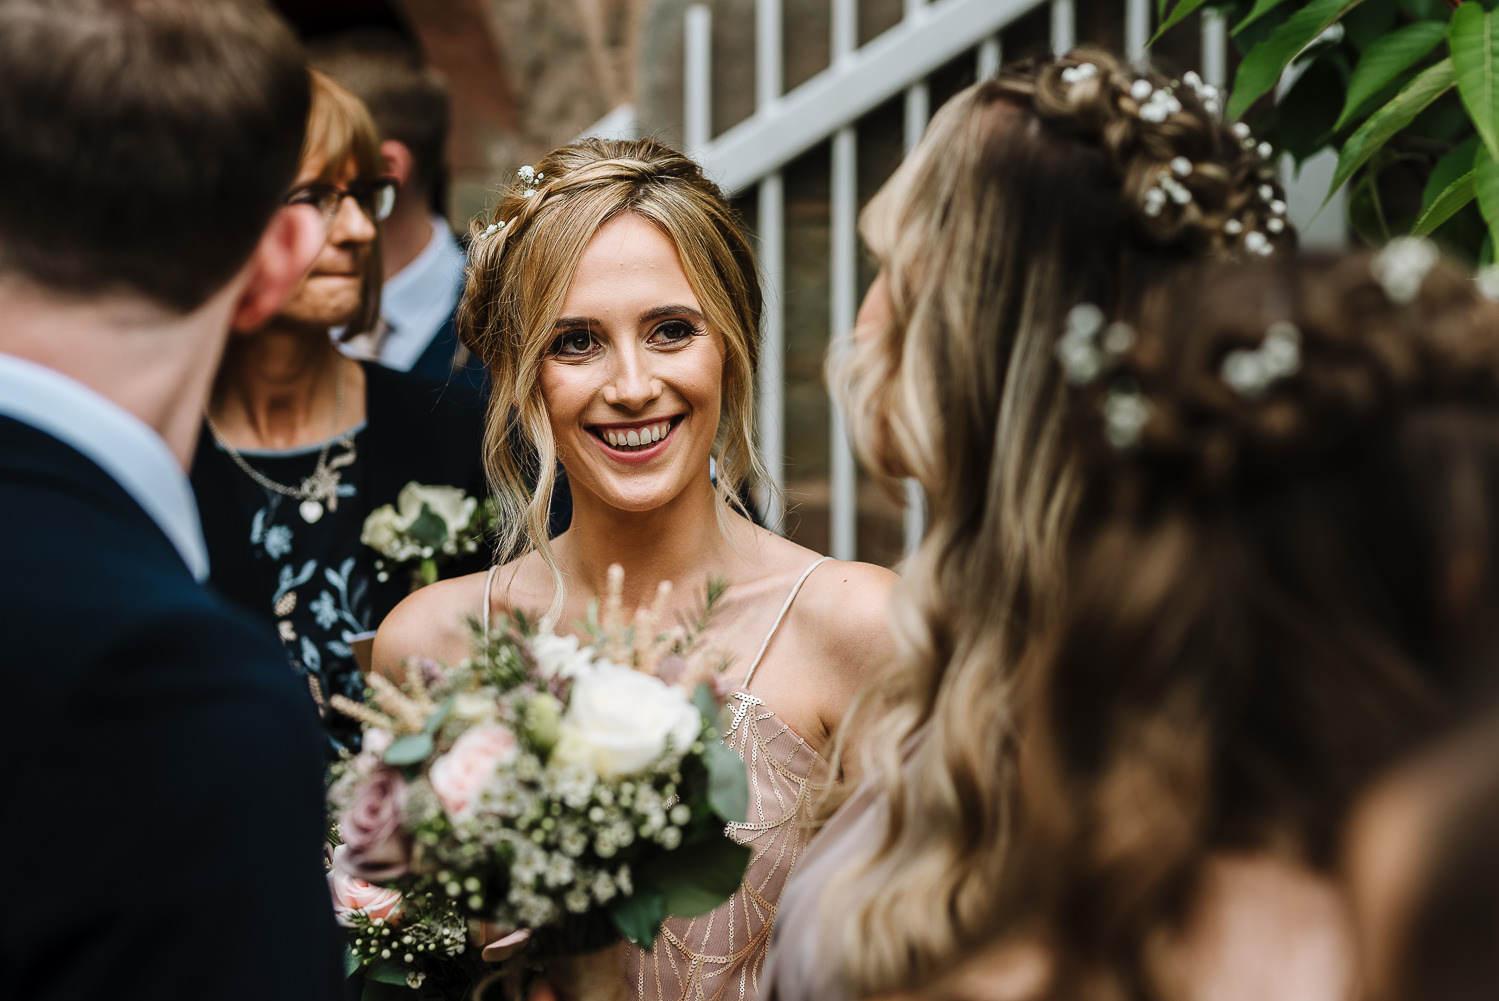 Brides sister smiling